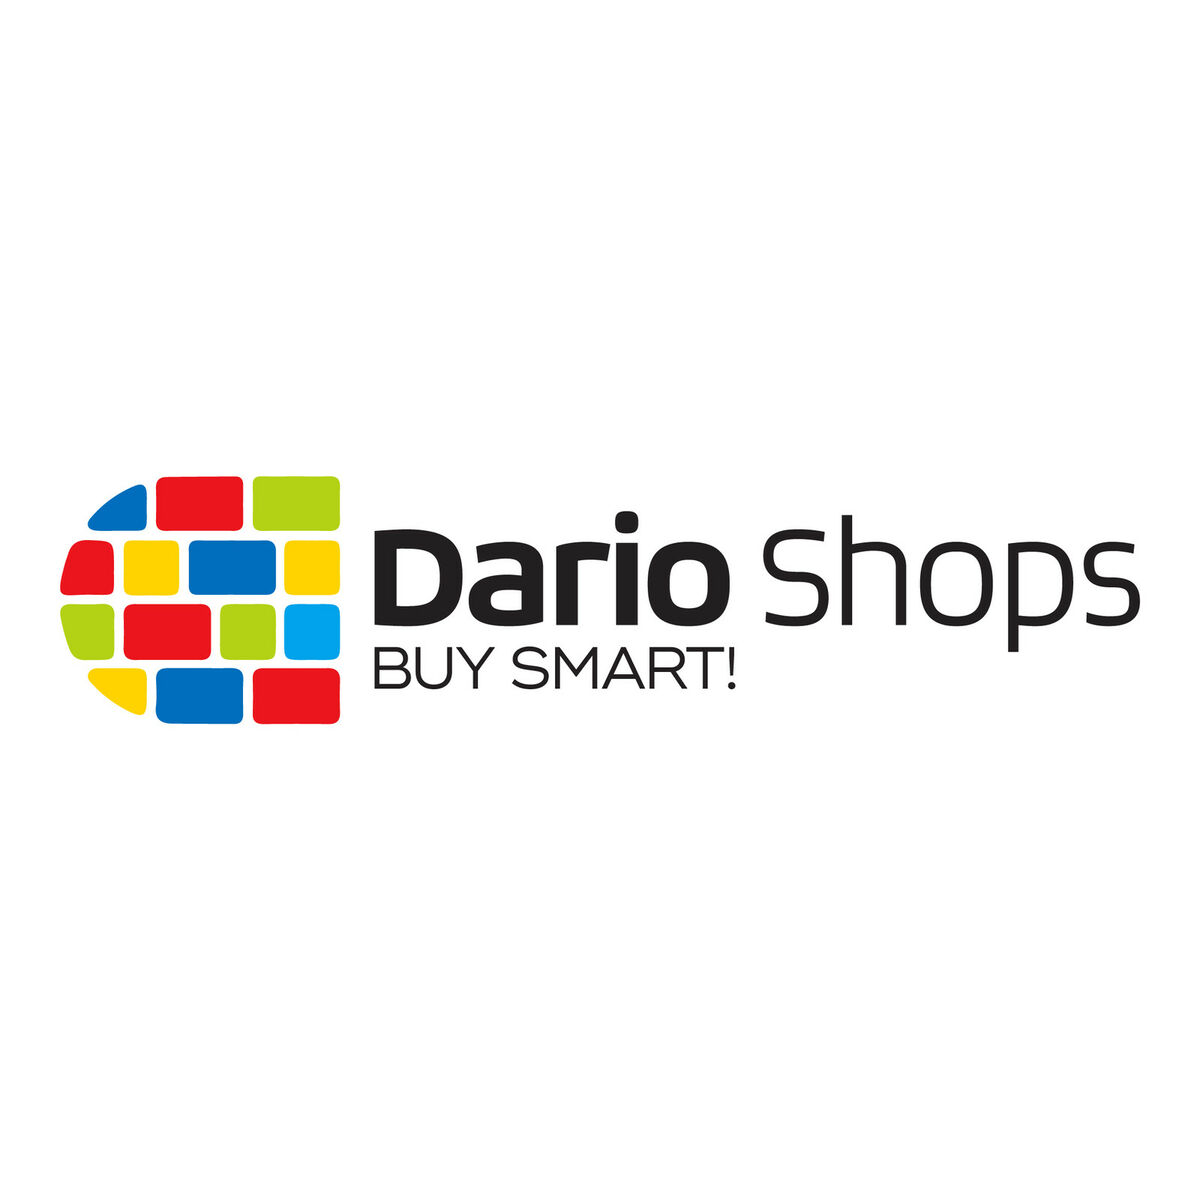 DarioShops